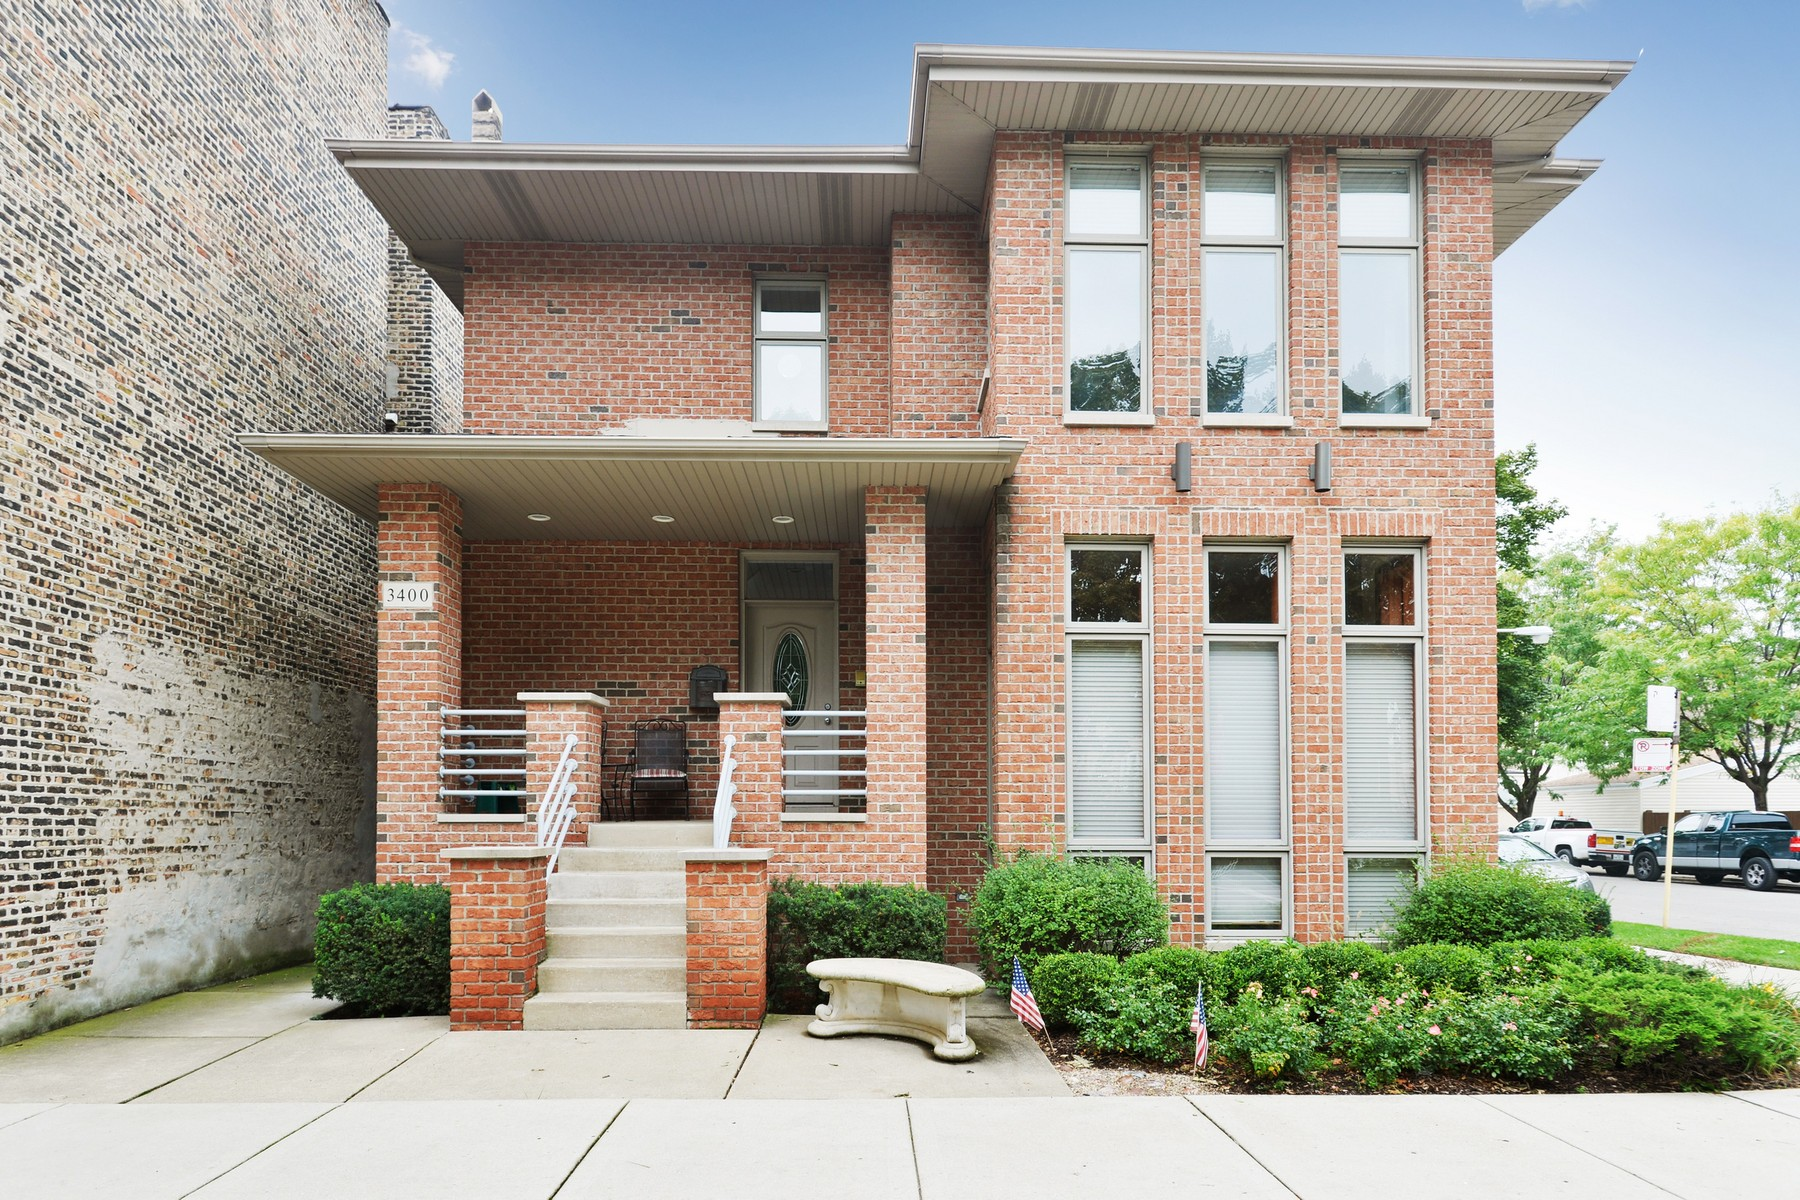 Nhà ở nhiều gia đình vì Bán tại Bridgeport Contemporary Two Unit 3400 S Union Avenue Bridgeport, Chicago, Illinois 60616 Hoa Kỳ